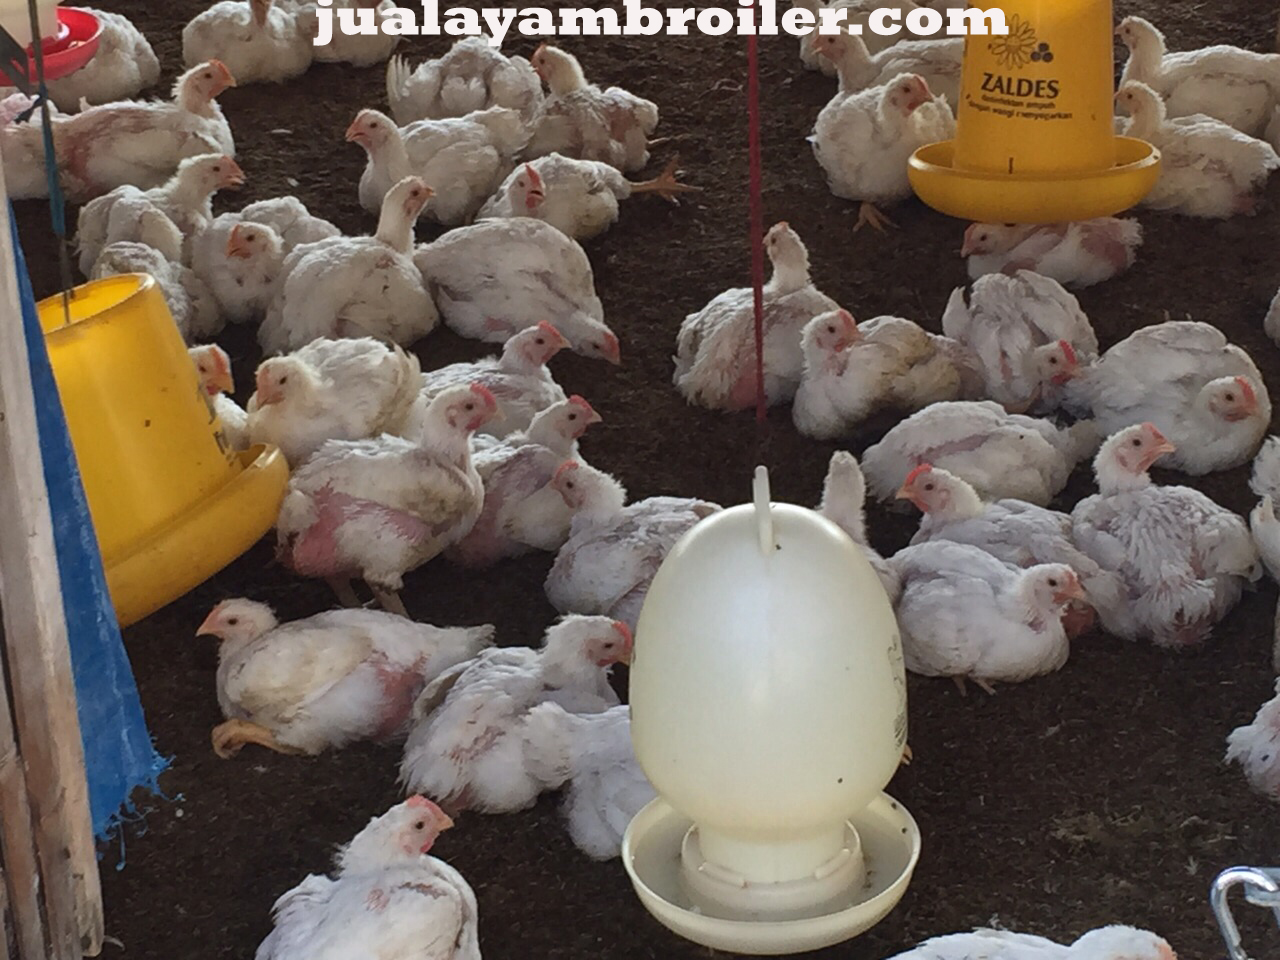 Jual Ayam Karkas Condet Jakarta Timur